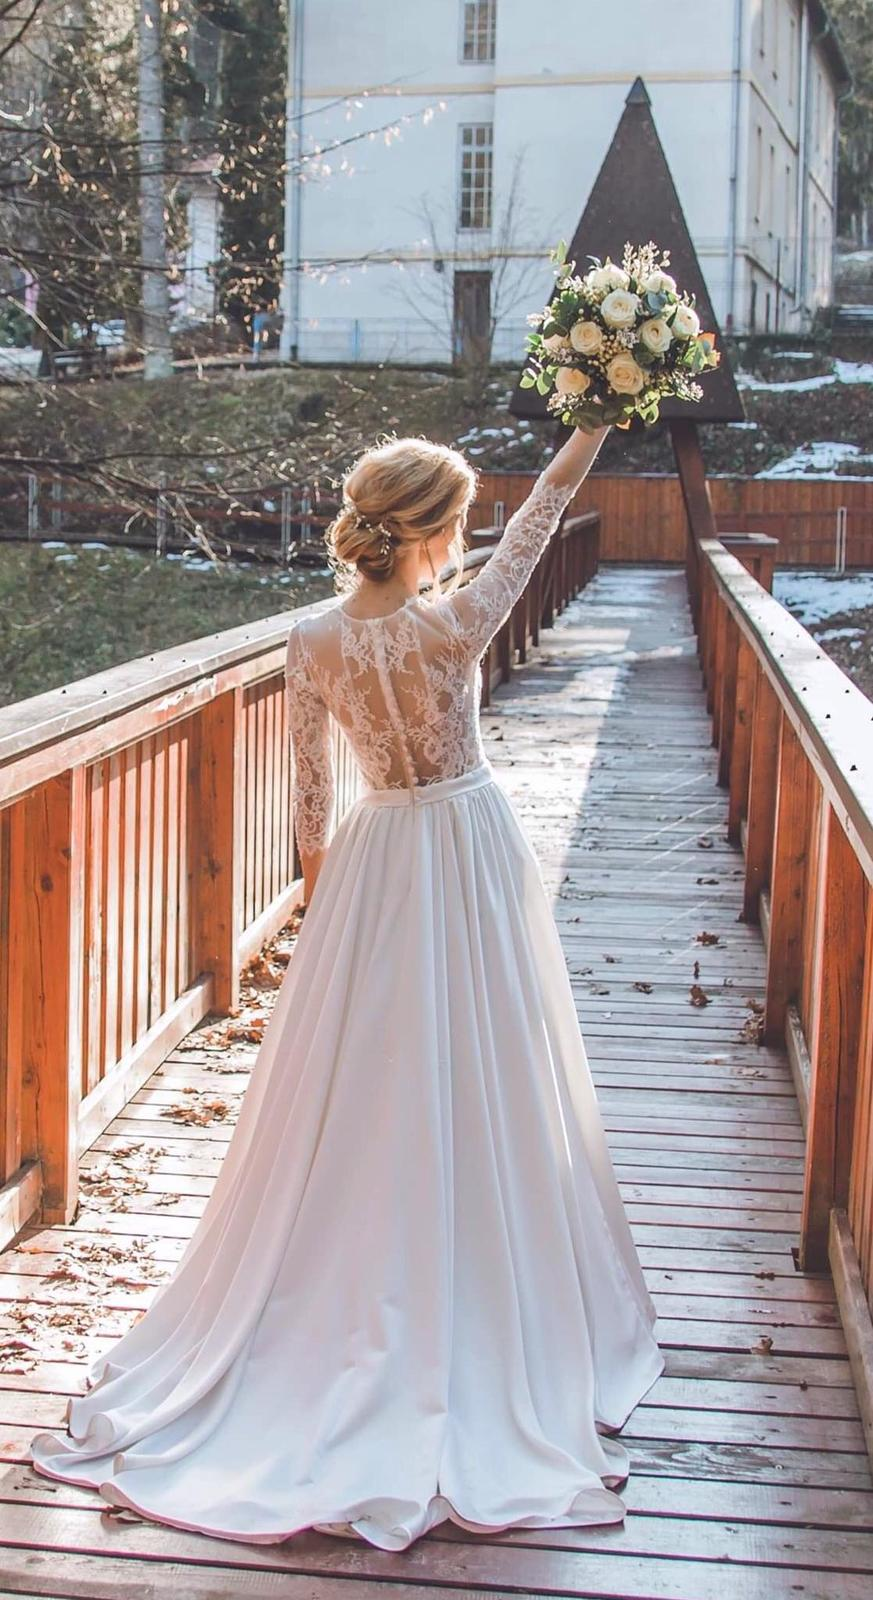 Svadobné šaty 32/34, IVORY - Obrázok č. 1